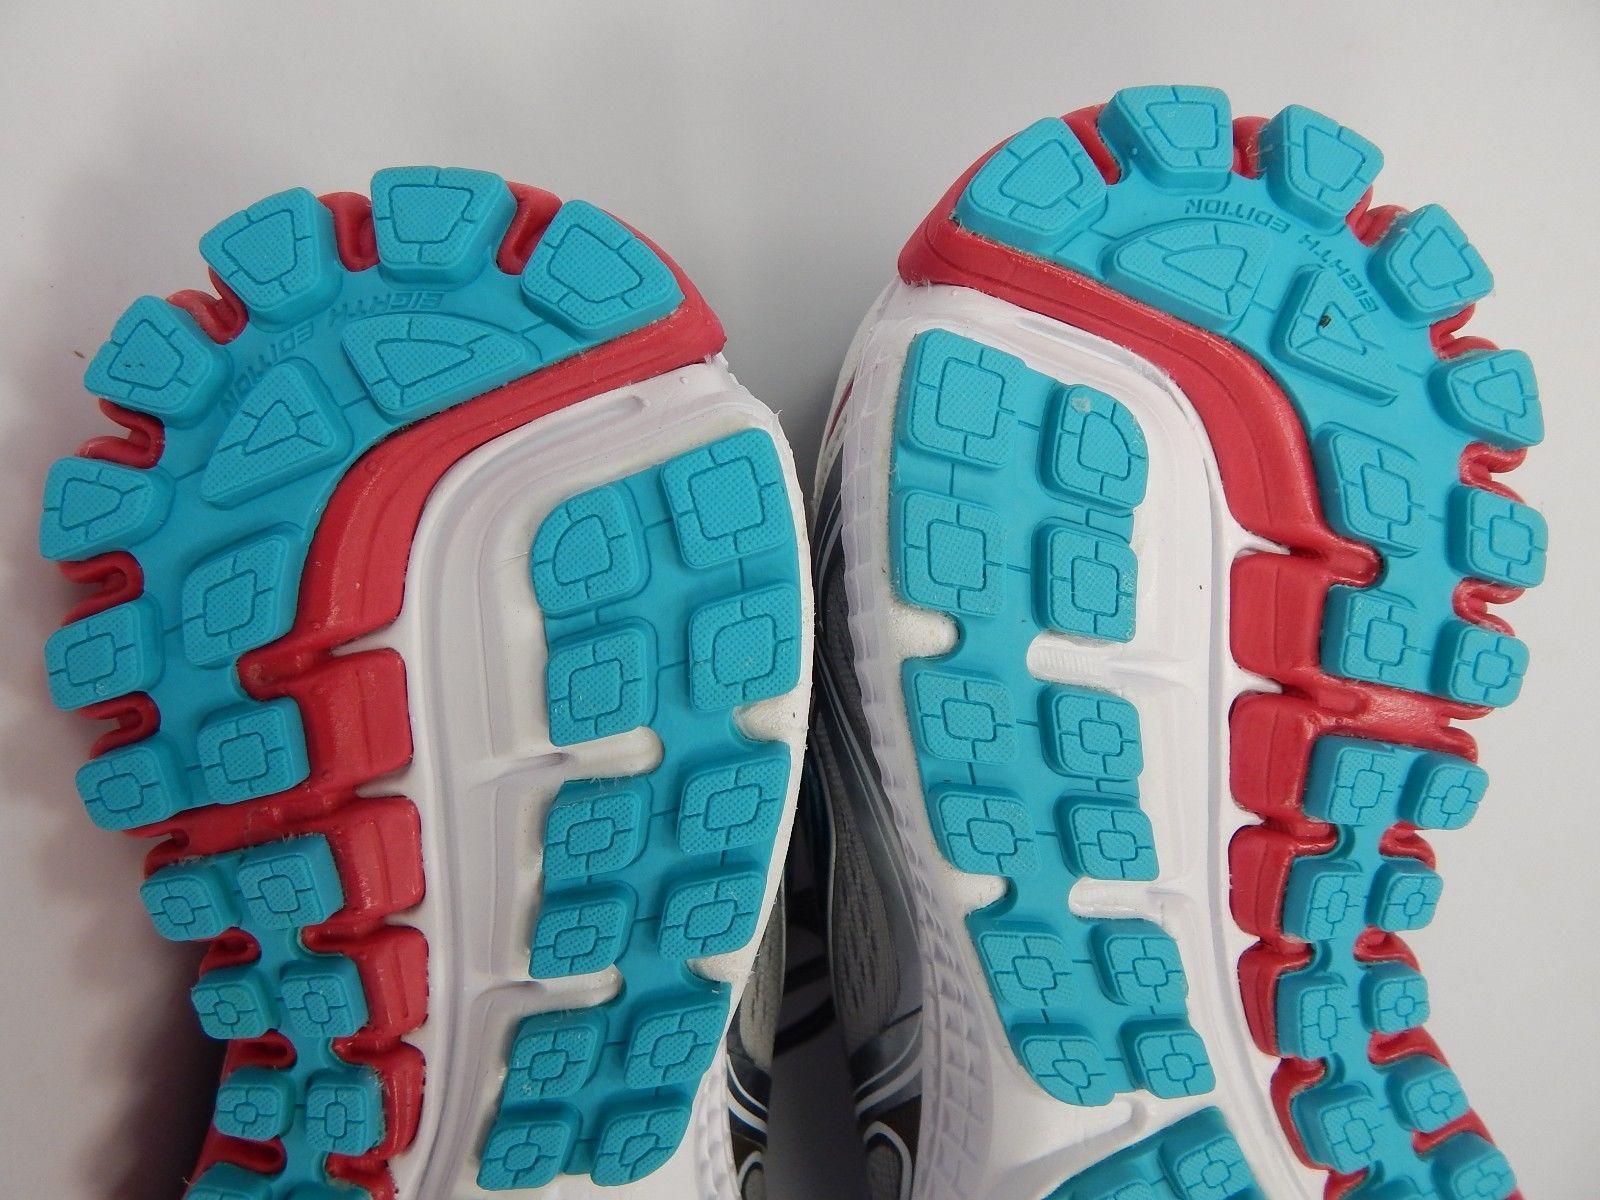 MISMATCH Brooks Ghost 8 Size 7.5 M (B) Left  & 8.5 M (B) Right Women's Shoes